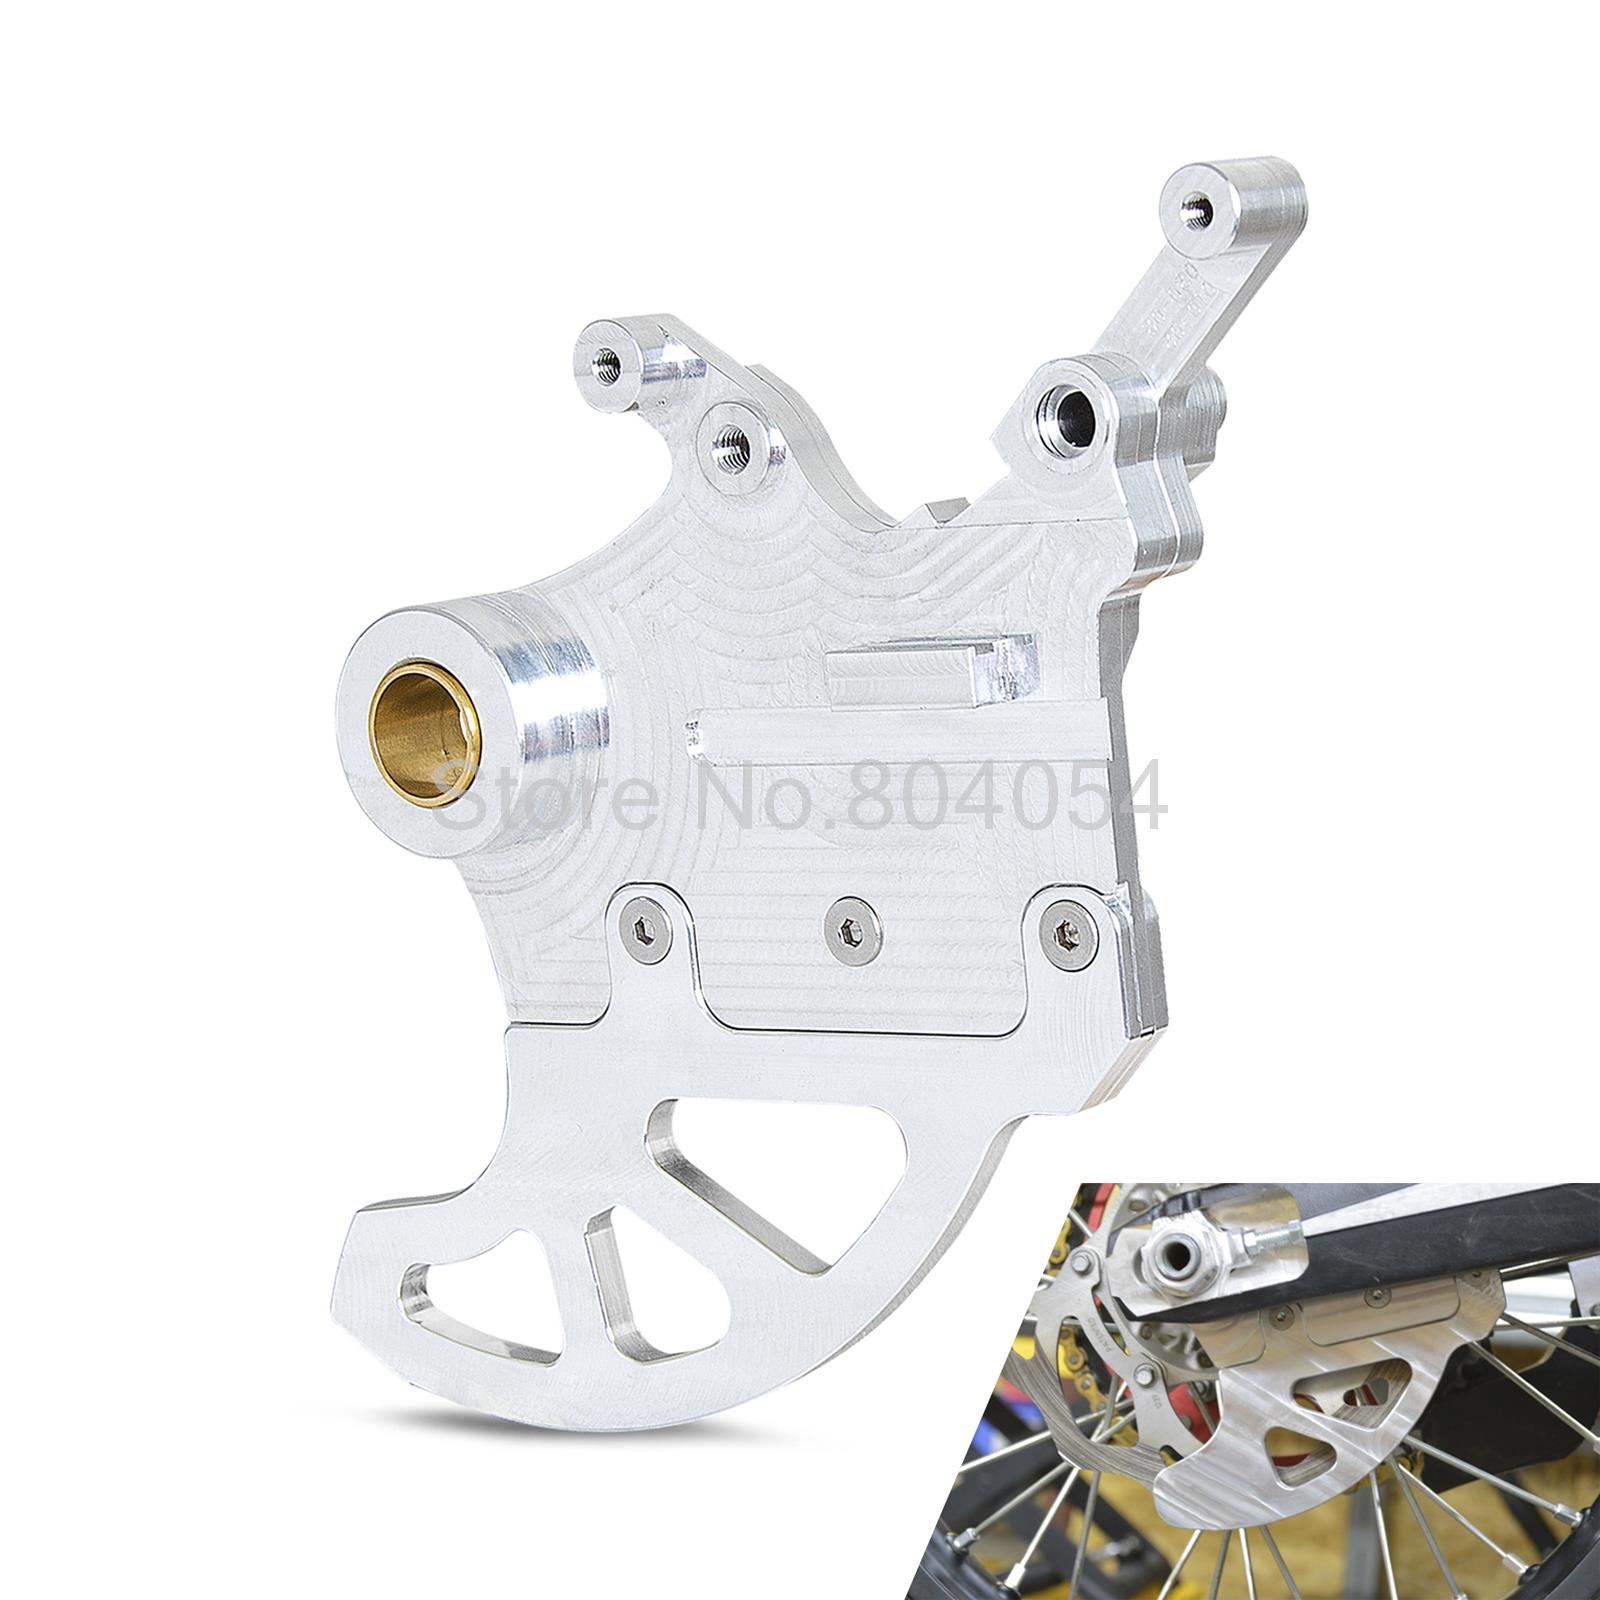 Brake Disc Guard Protector for Yamaha YZ125 YZ250 YZ250F YZ450F WR250 WR450 YZ250X YZ250FX YZ450X YZ450FX yamaha 125 yz цепь